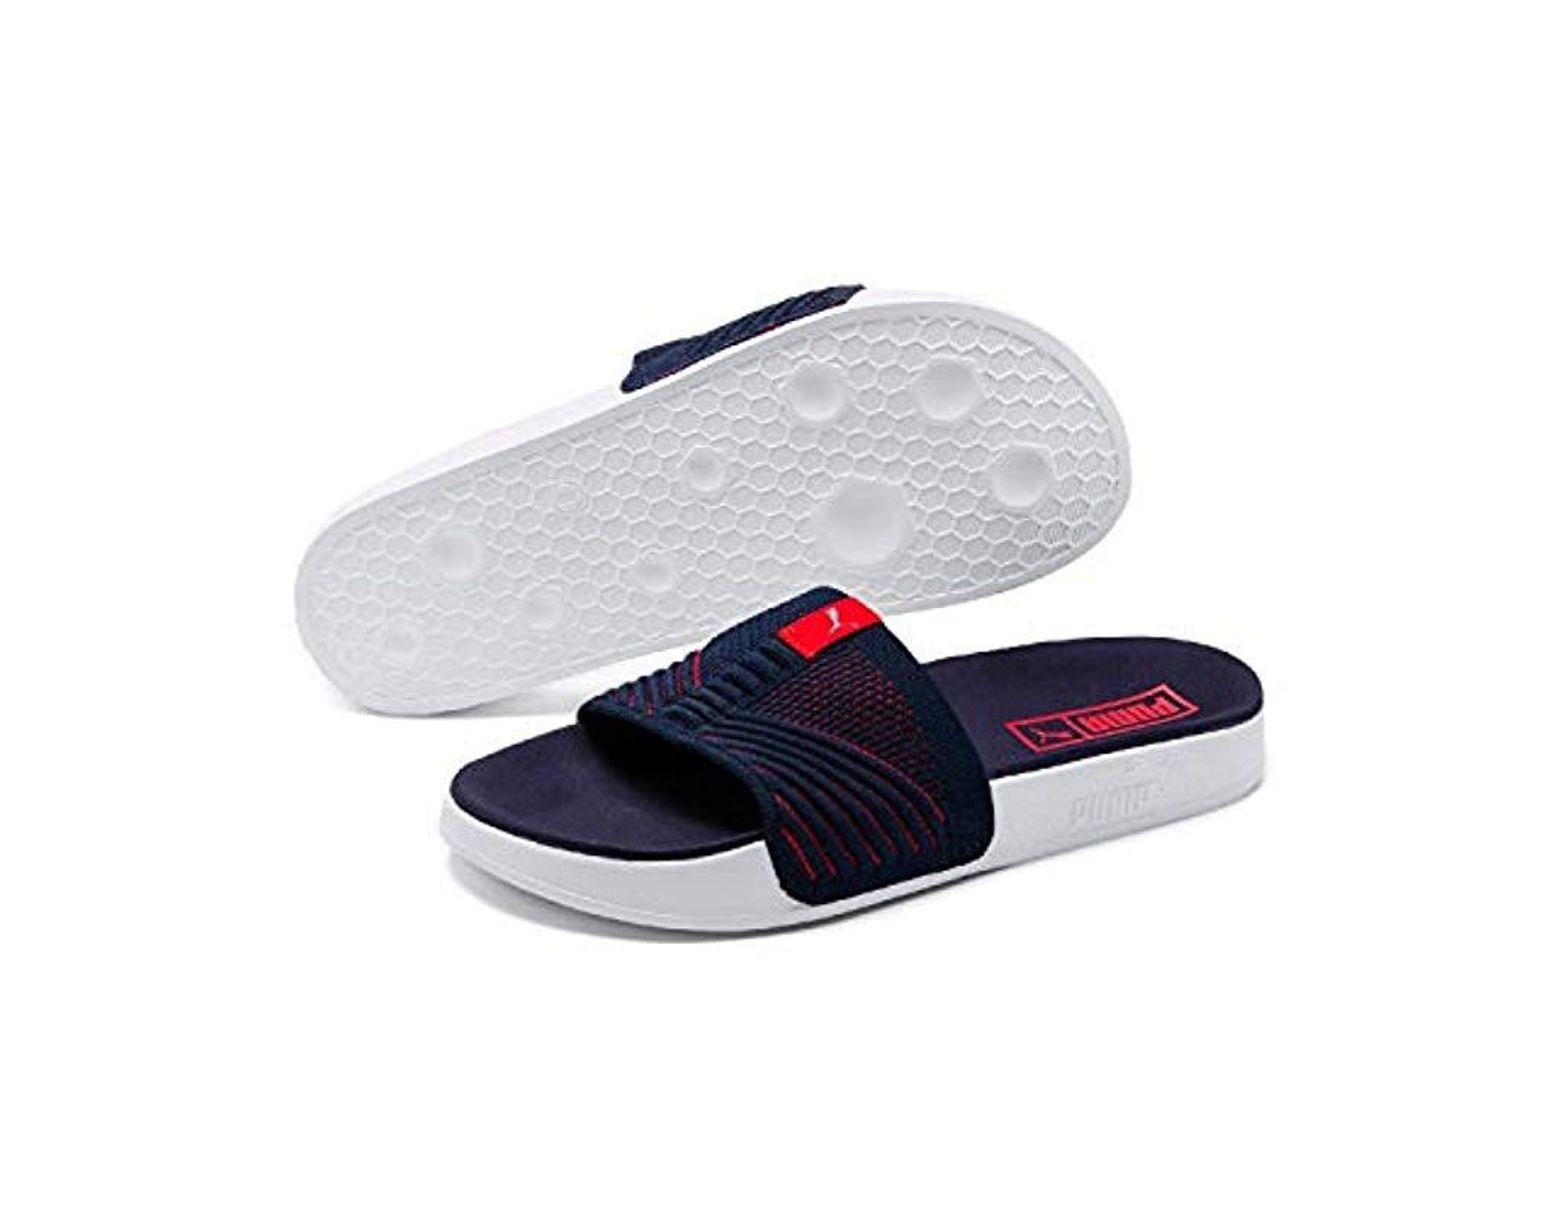 af142f5afa Blue Unisex Adults' Leadcat Knit Premium Beach & Pool Shoes